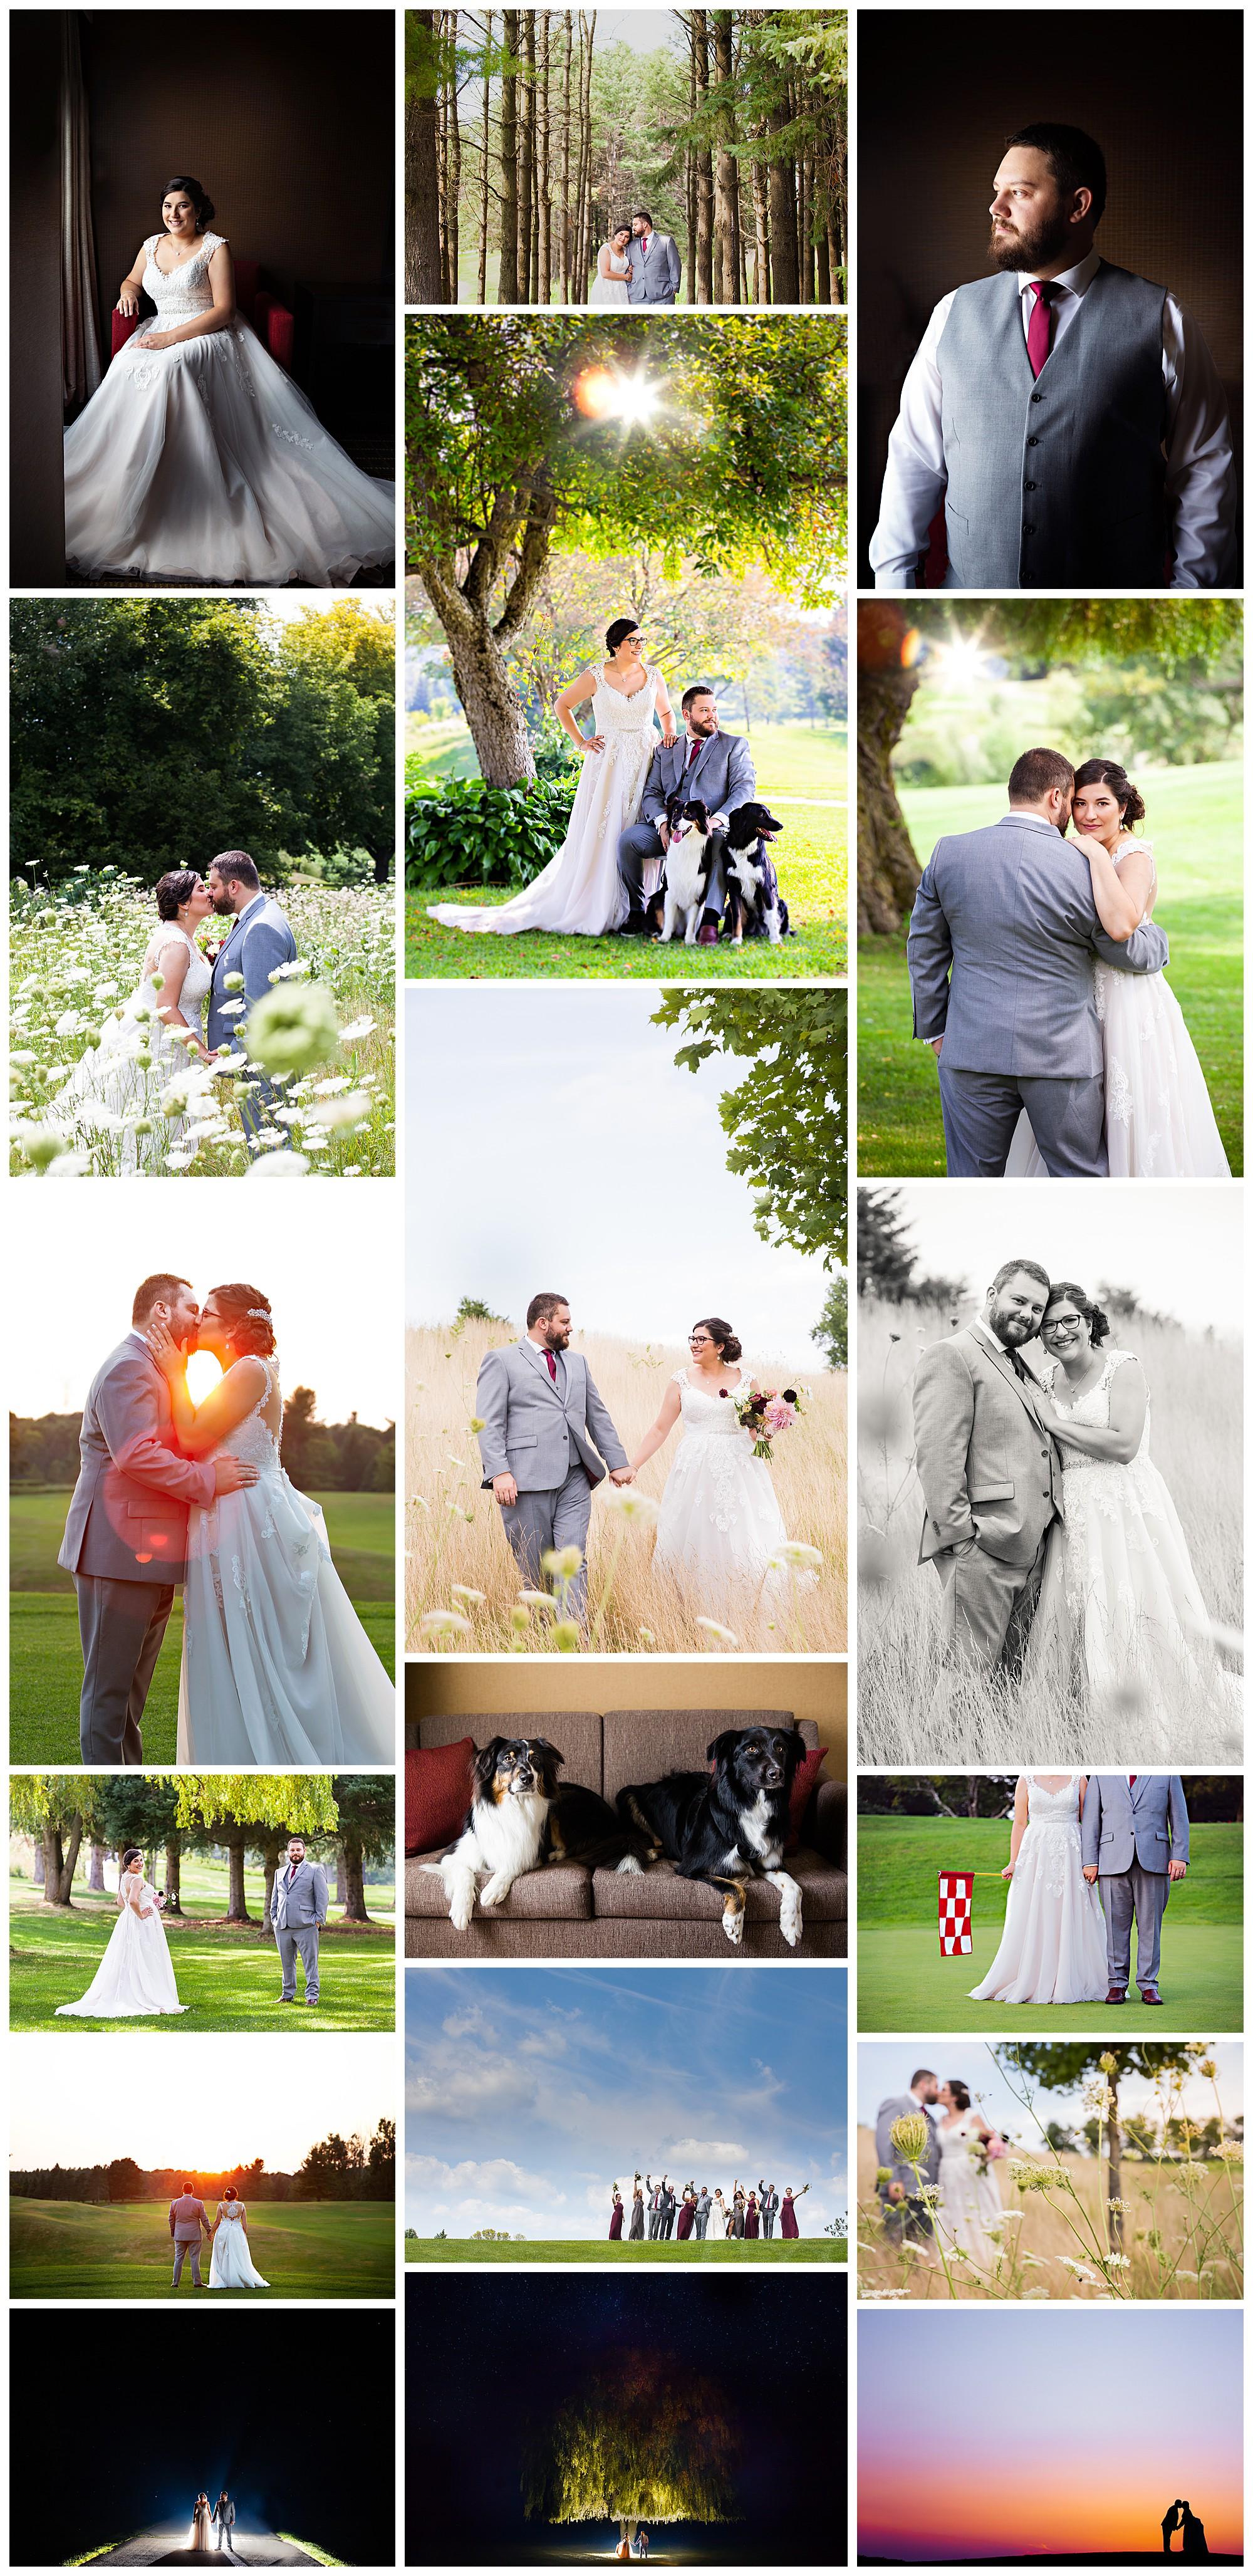 Flamborough Hills Golf & Country Club, Hamilton, Ontario wedding photos by VanDaele & Russell